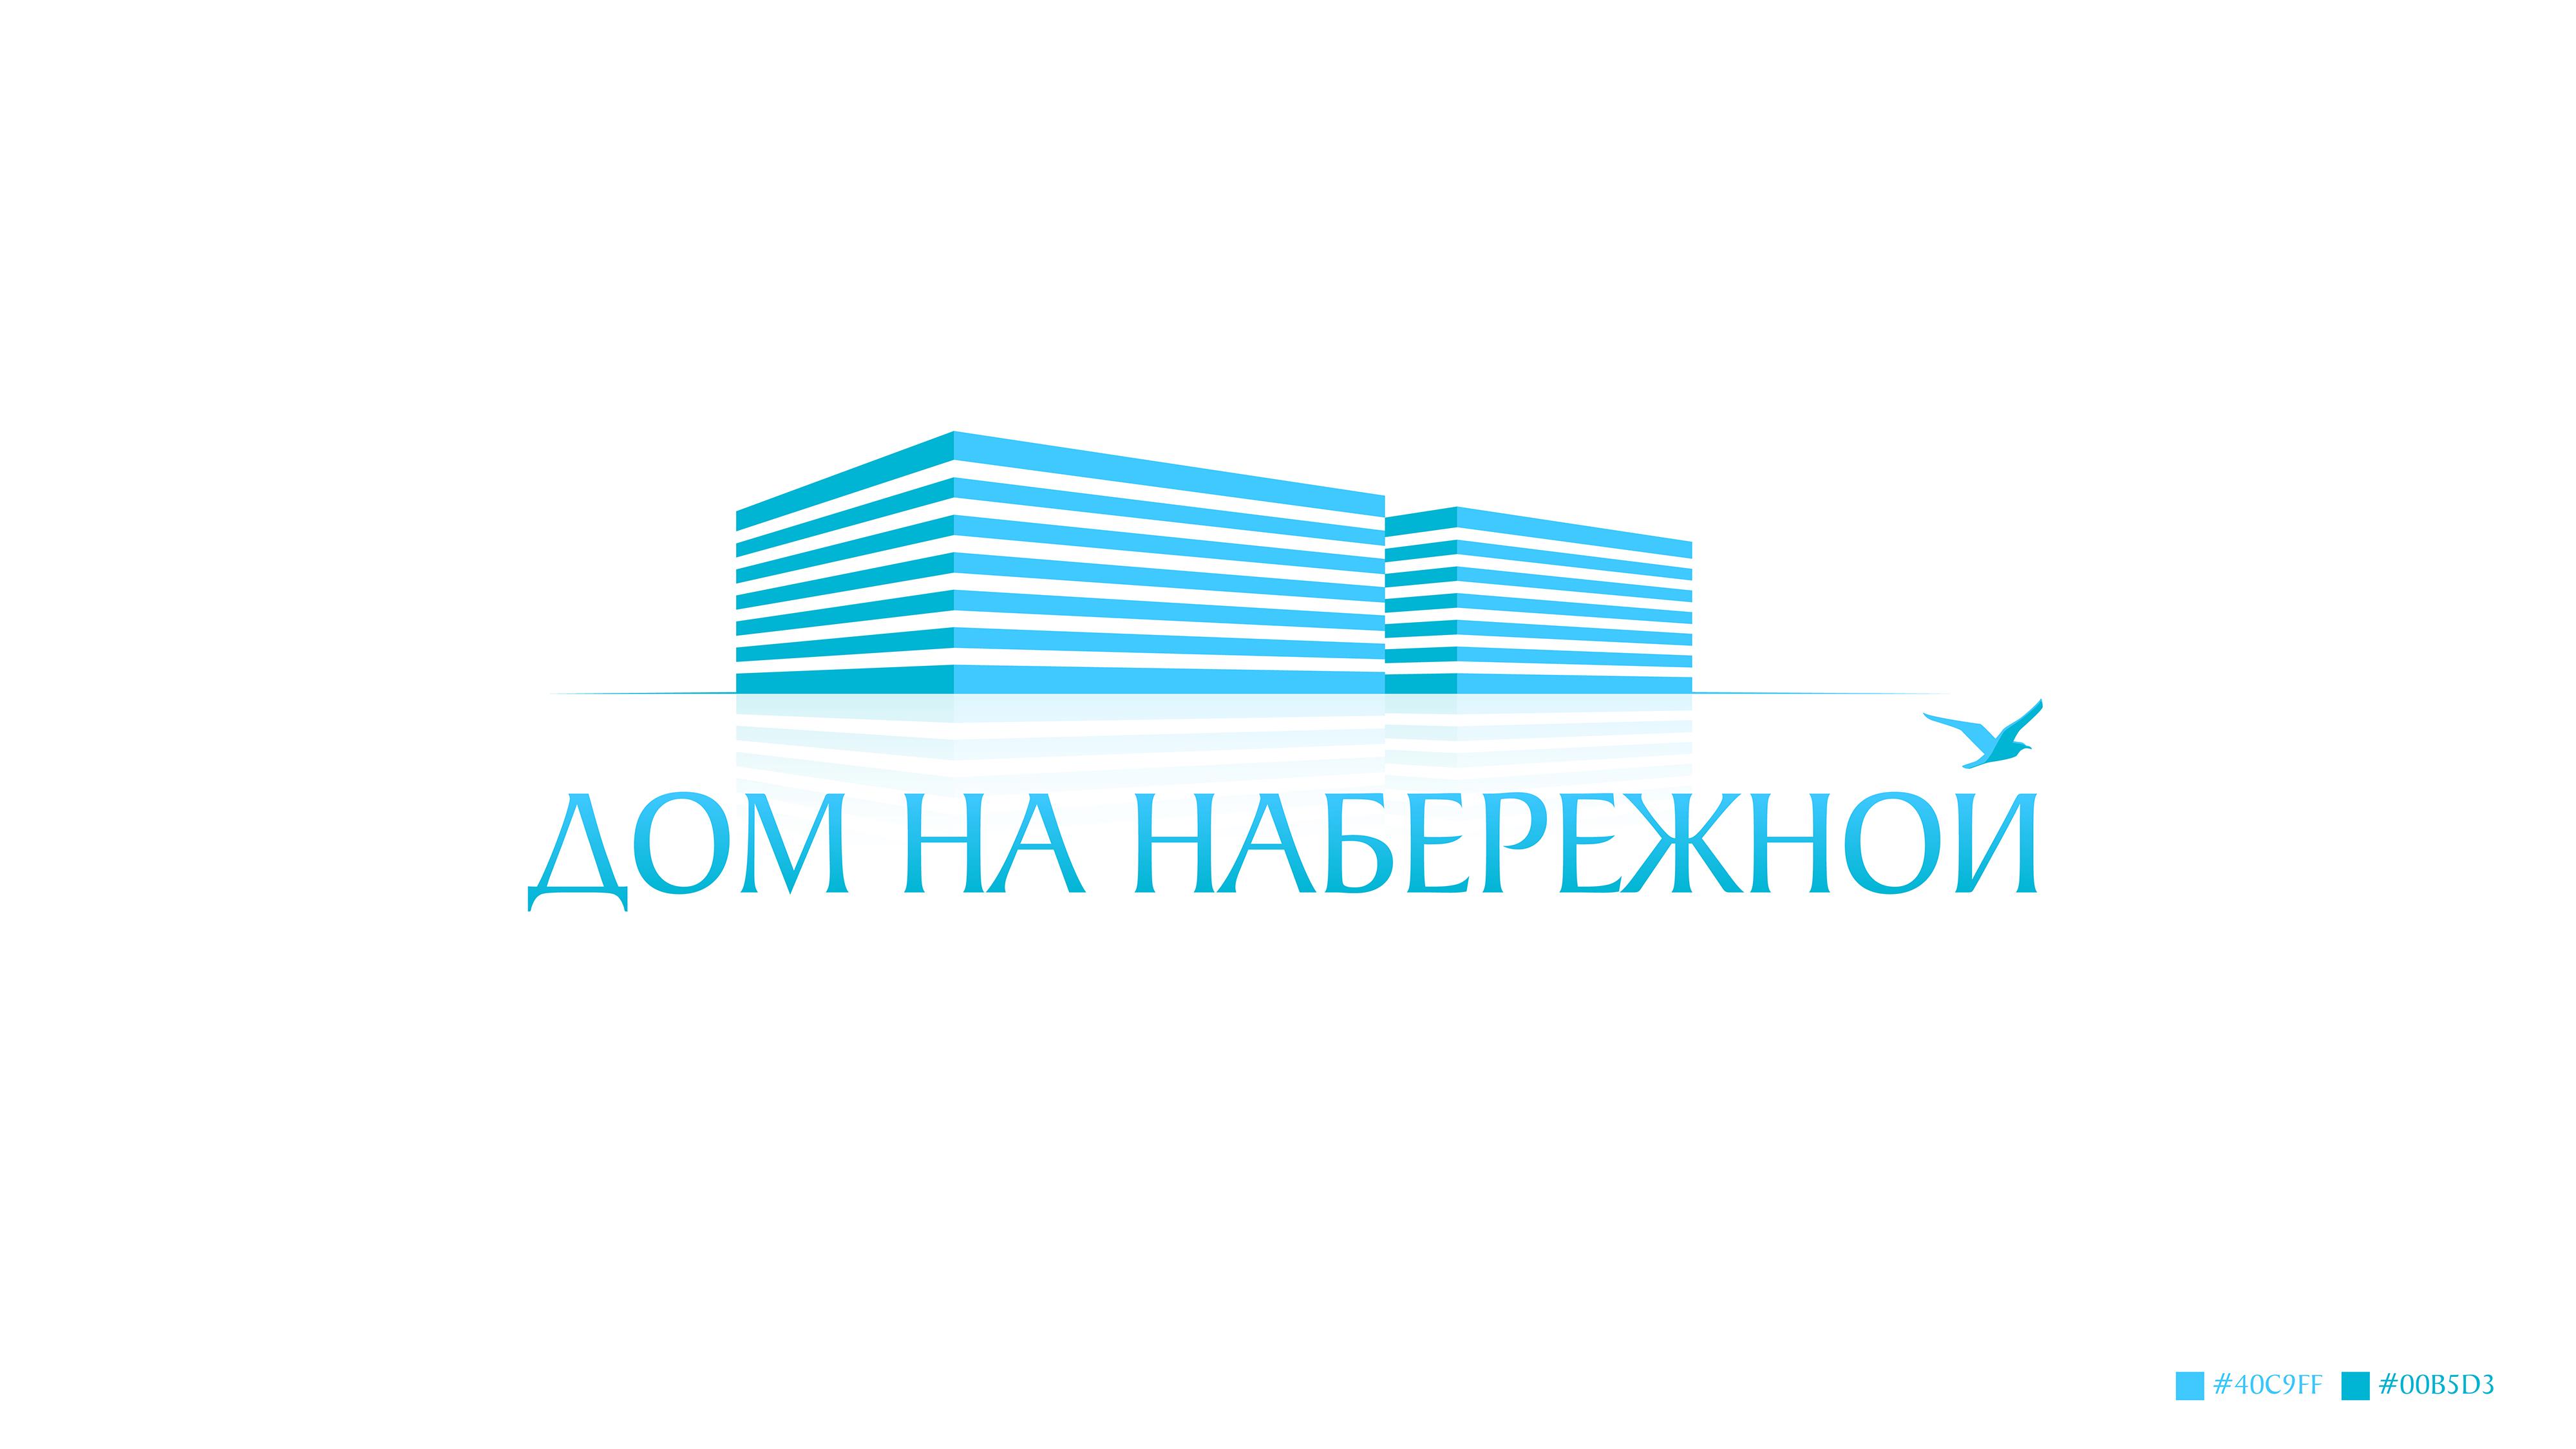 РАЗРАБОТКА логотипа для ЖИЛОГО КОМПЛЕКСА премиум В АНАПЕ.  фото f_5585ded4bd81a267.jpg